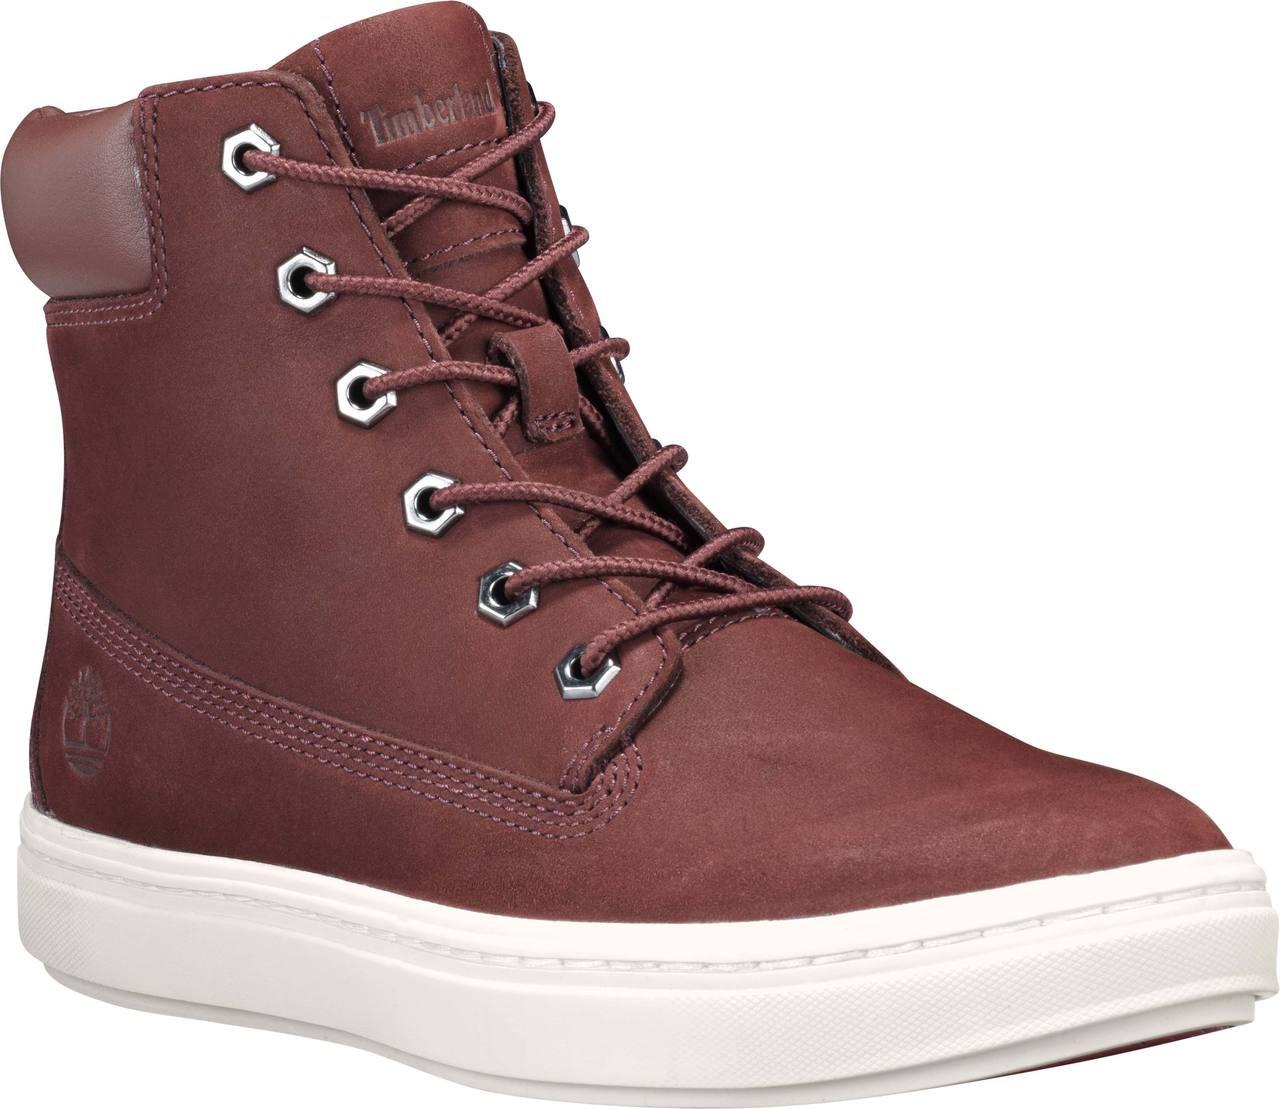 e6c142e46c11b3 ... Timberland Women s Londyn 6-Inch Sneaker Boots. Burgundy Nubuck